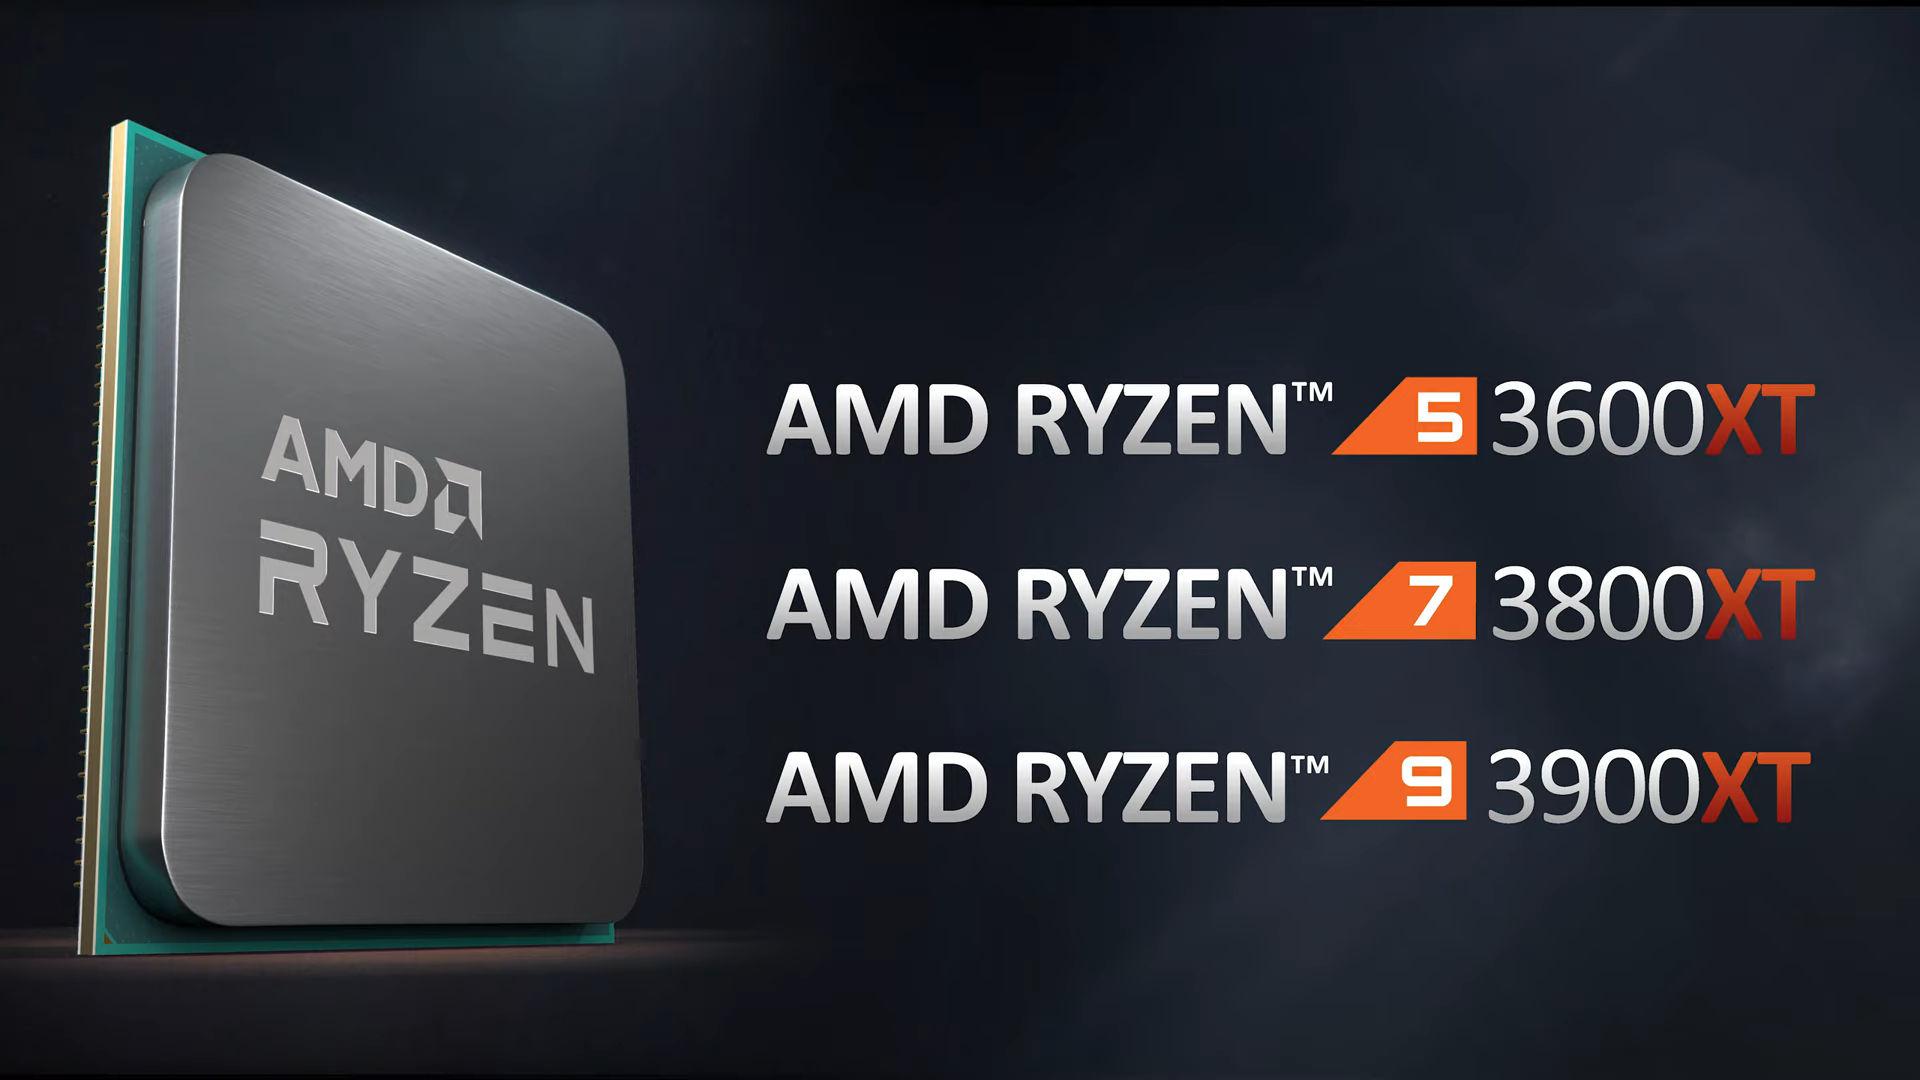 AMD Ryzen 9 3900XT, Ryzen 7 3800XT, Ryzen 5 3600XT Matisse Refresh ...